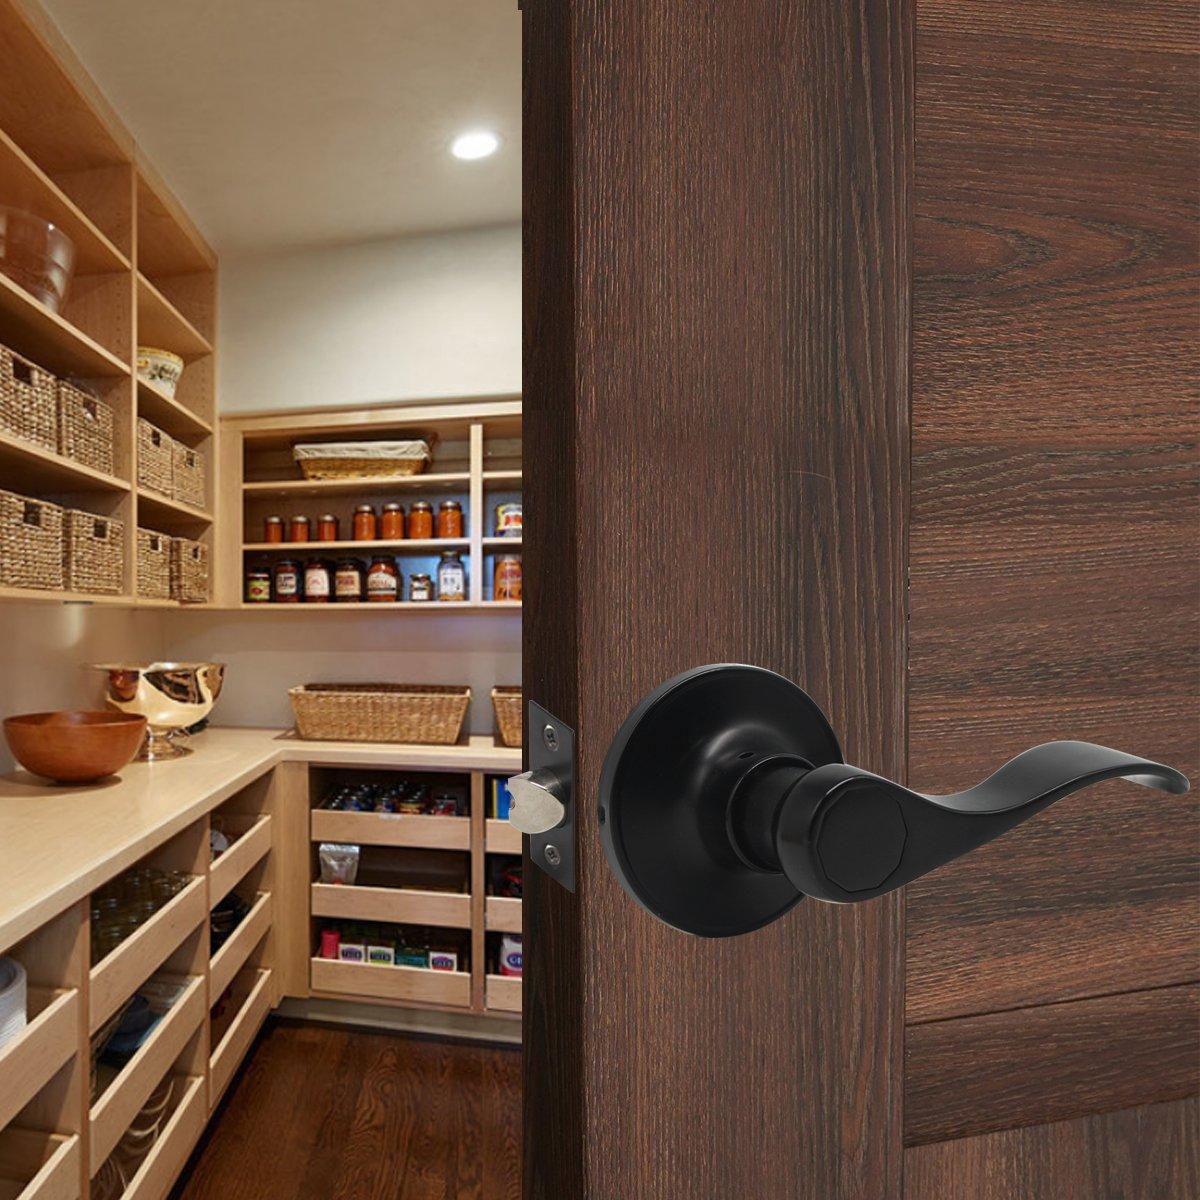 Gobrico 3 Pack Black Interior Door Handles Passage Levers,for Hall//Closet